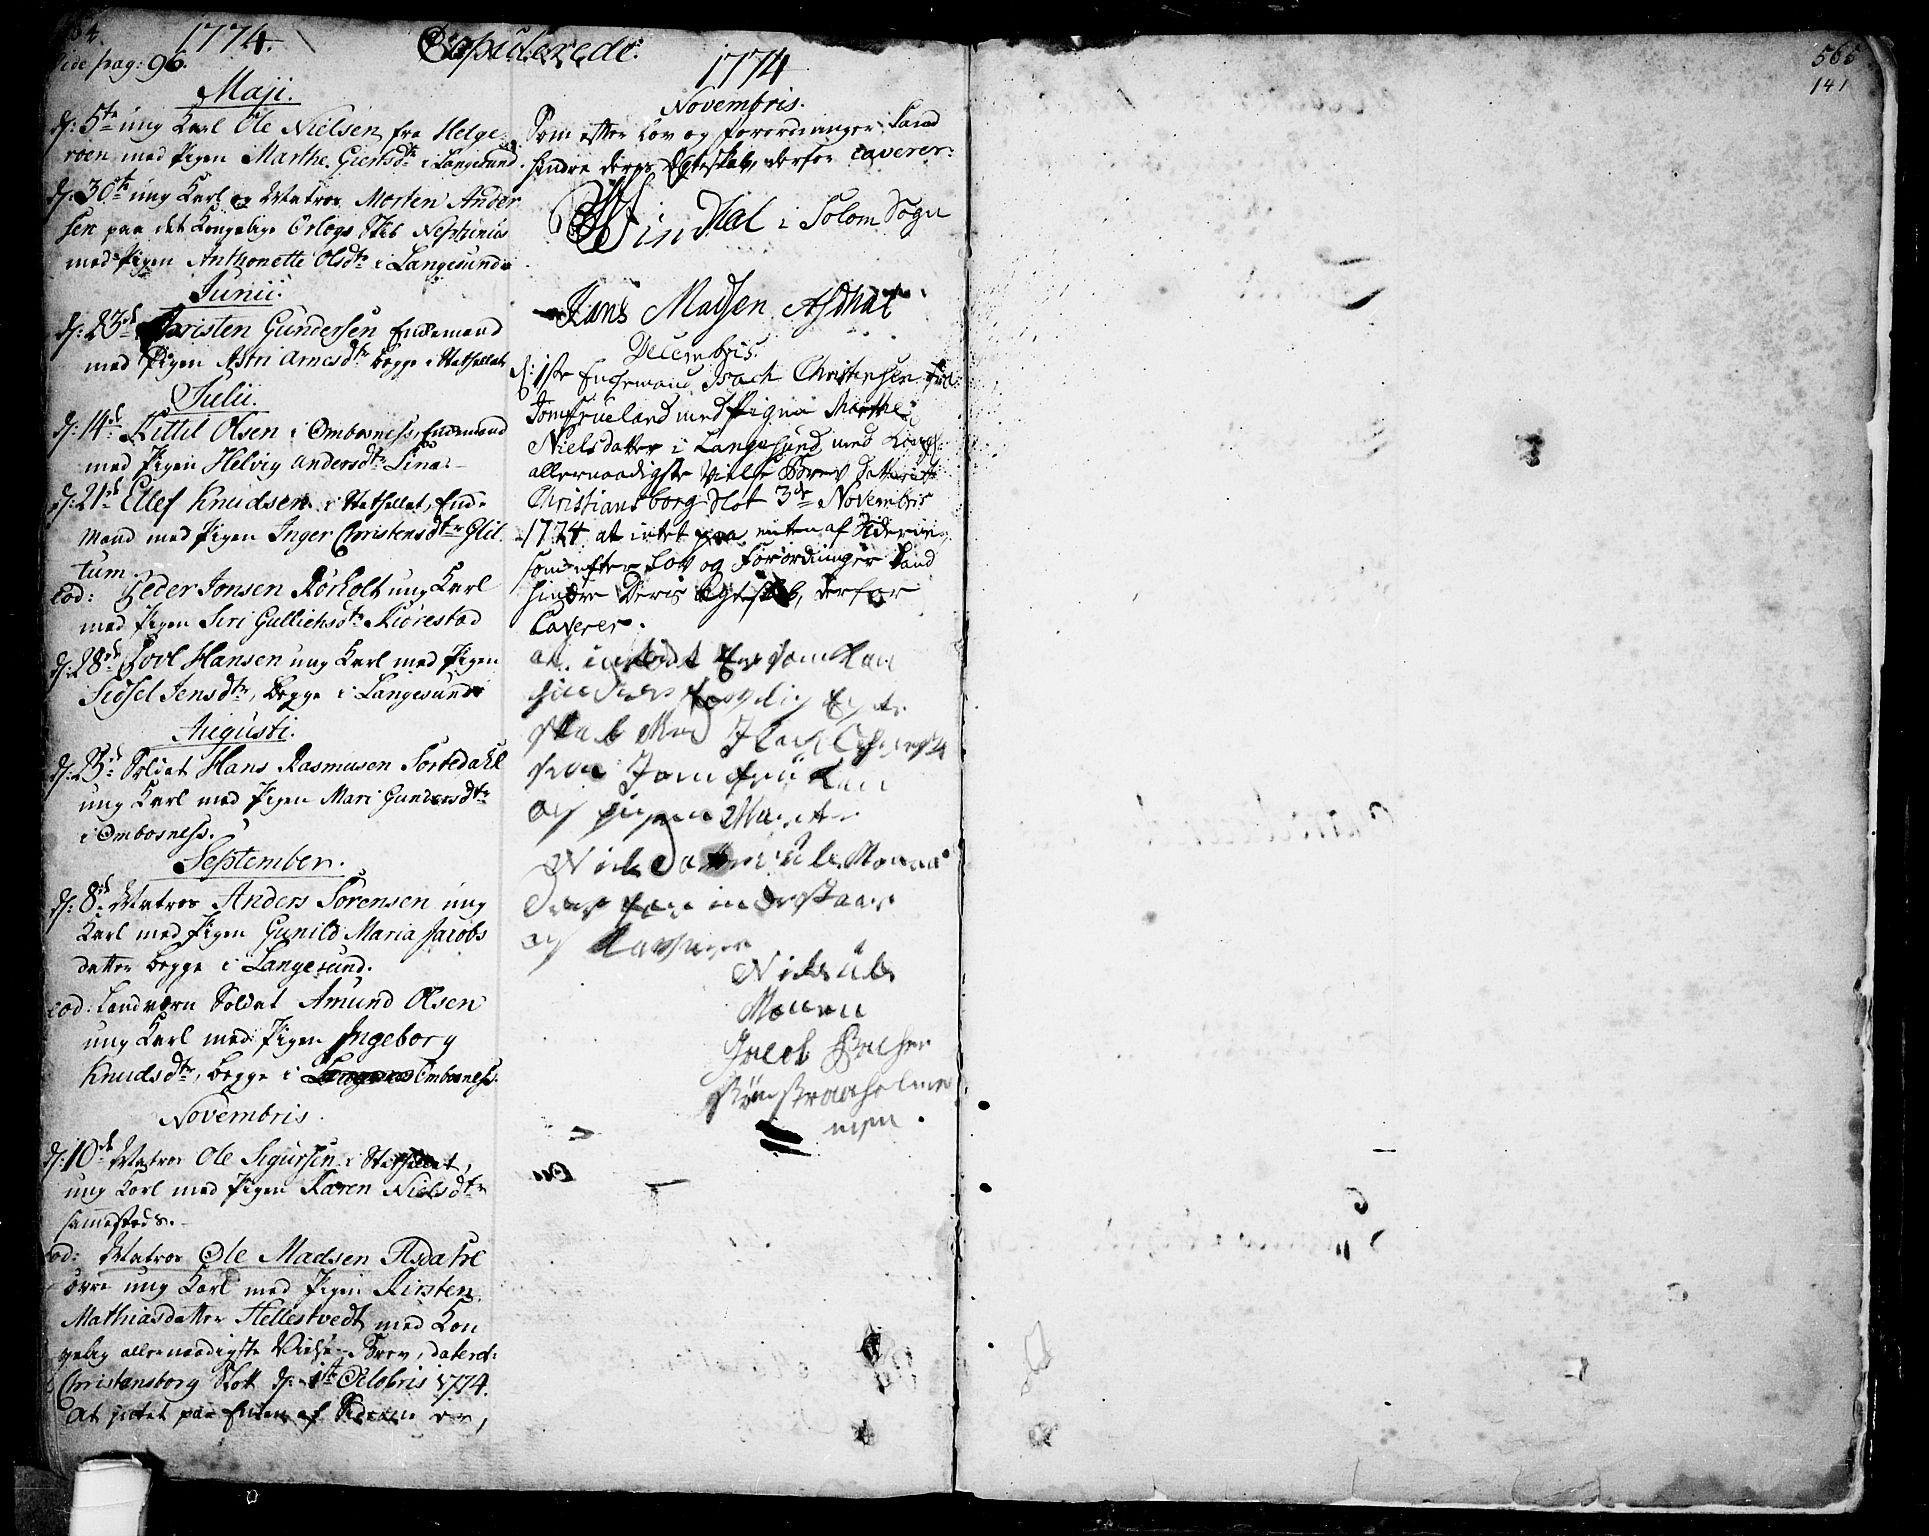 SAKO, Bamble kirkebøker, F/Fa/L0001: Ministerialbok nr. I 1, 1702-1774, s. 564-565